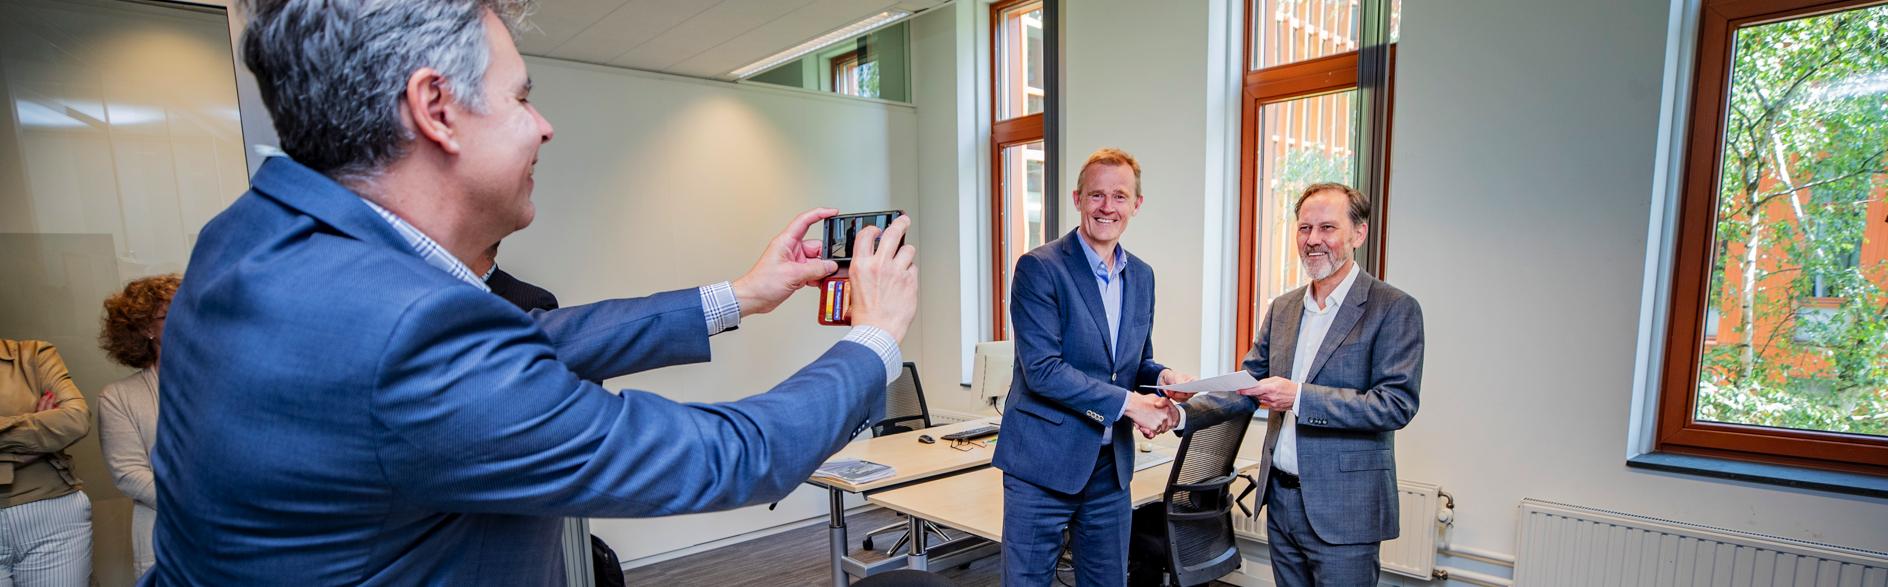 Parlaeus ondersteunt besluitvorming gemeenteraad van Apeldoorn